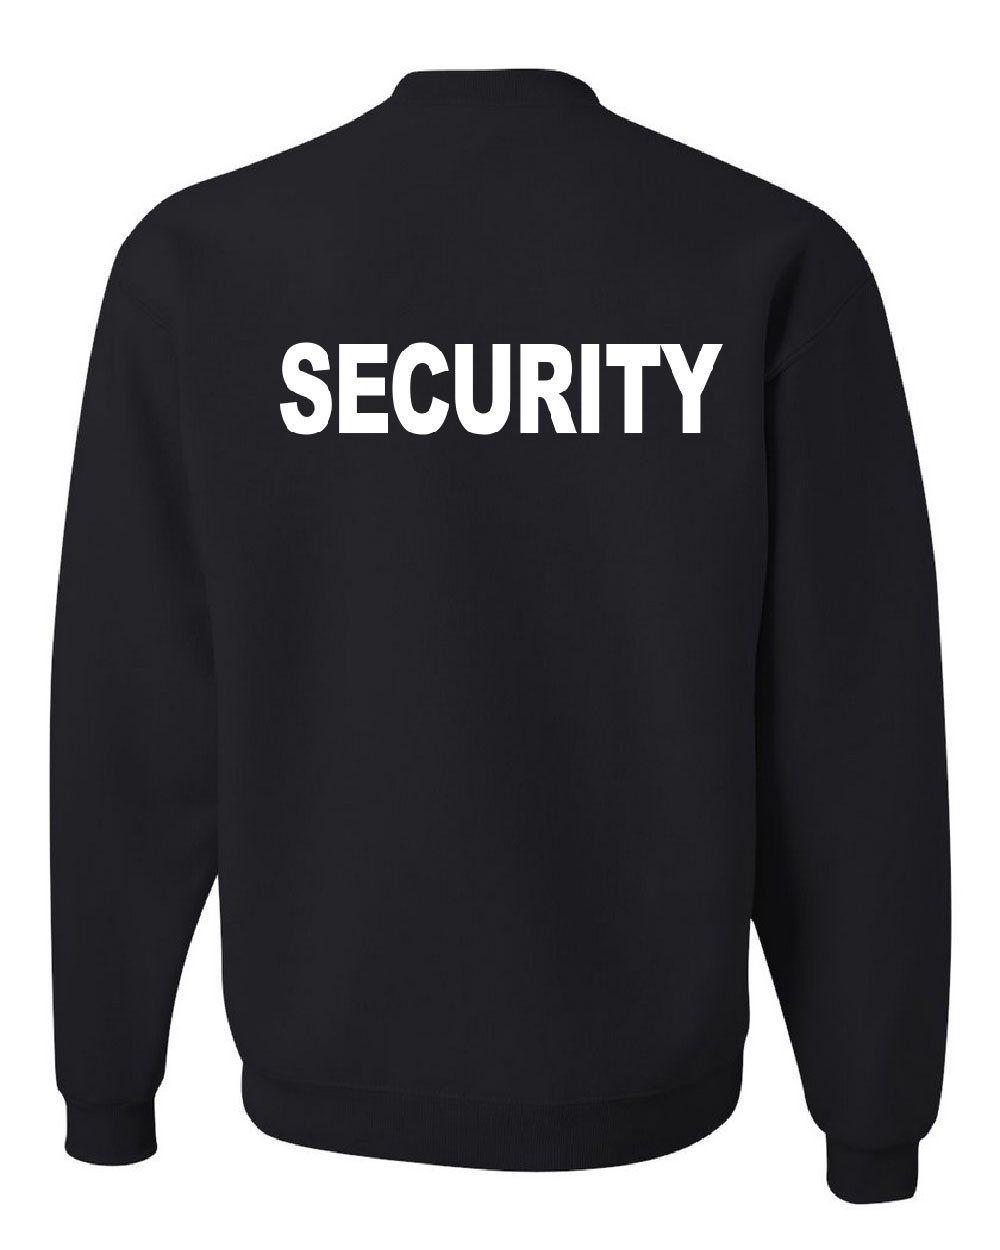 Security Sweatshirt Bouncer Police Event Staff Uniform Guard ...